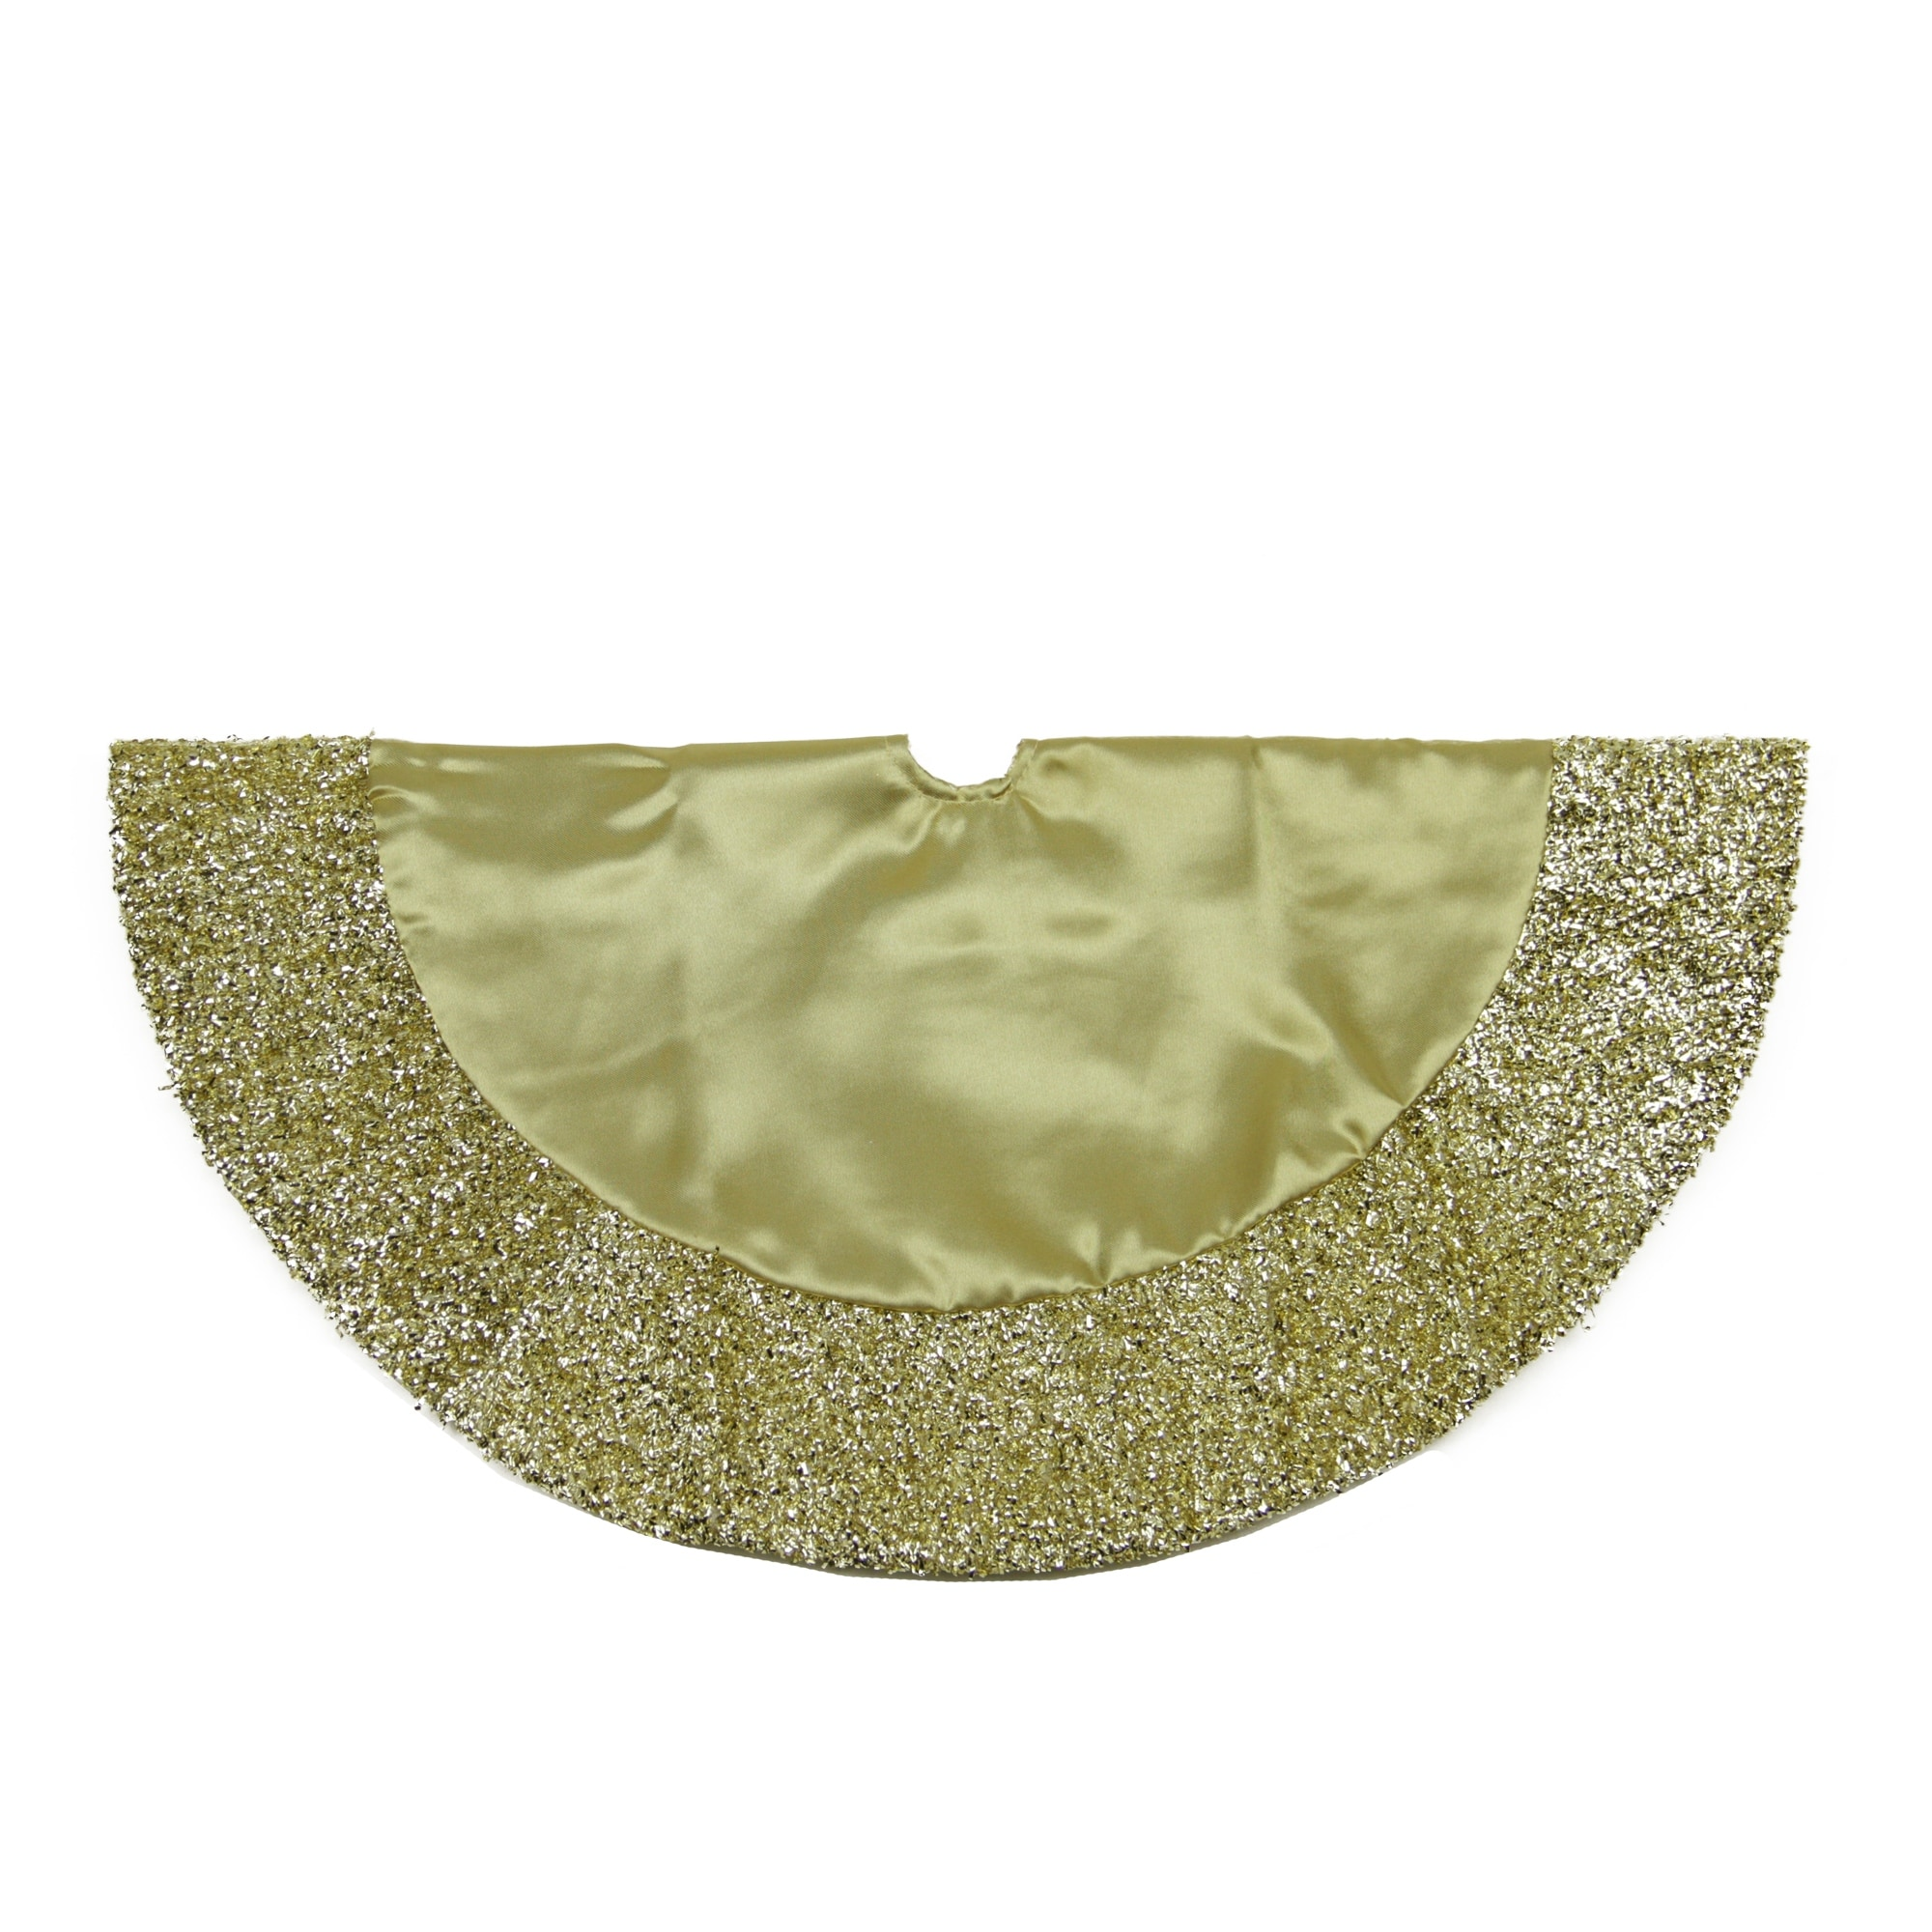 Mini Christmas Tree Skirt Pattern.20 Gold Mini Christmas Tree Skirt With Metallic Tinsel Trim N A